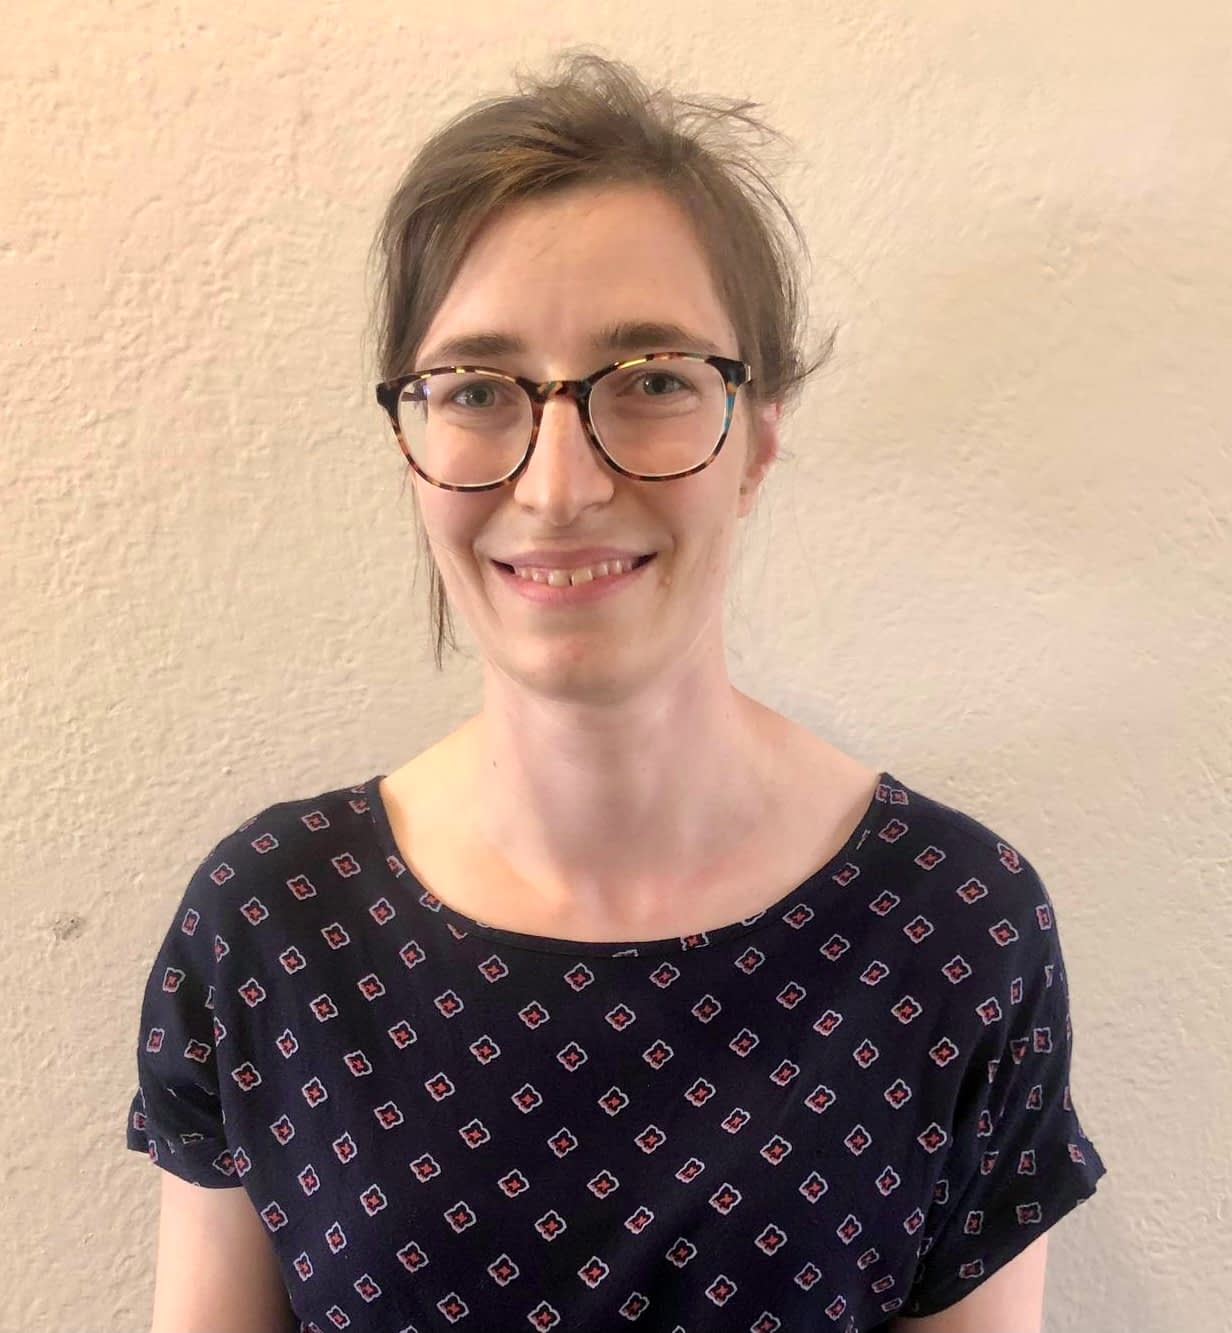 Kiri Kreger, Occupational Therapist at Independent Rehabilitation Services